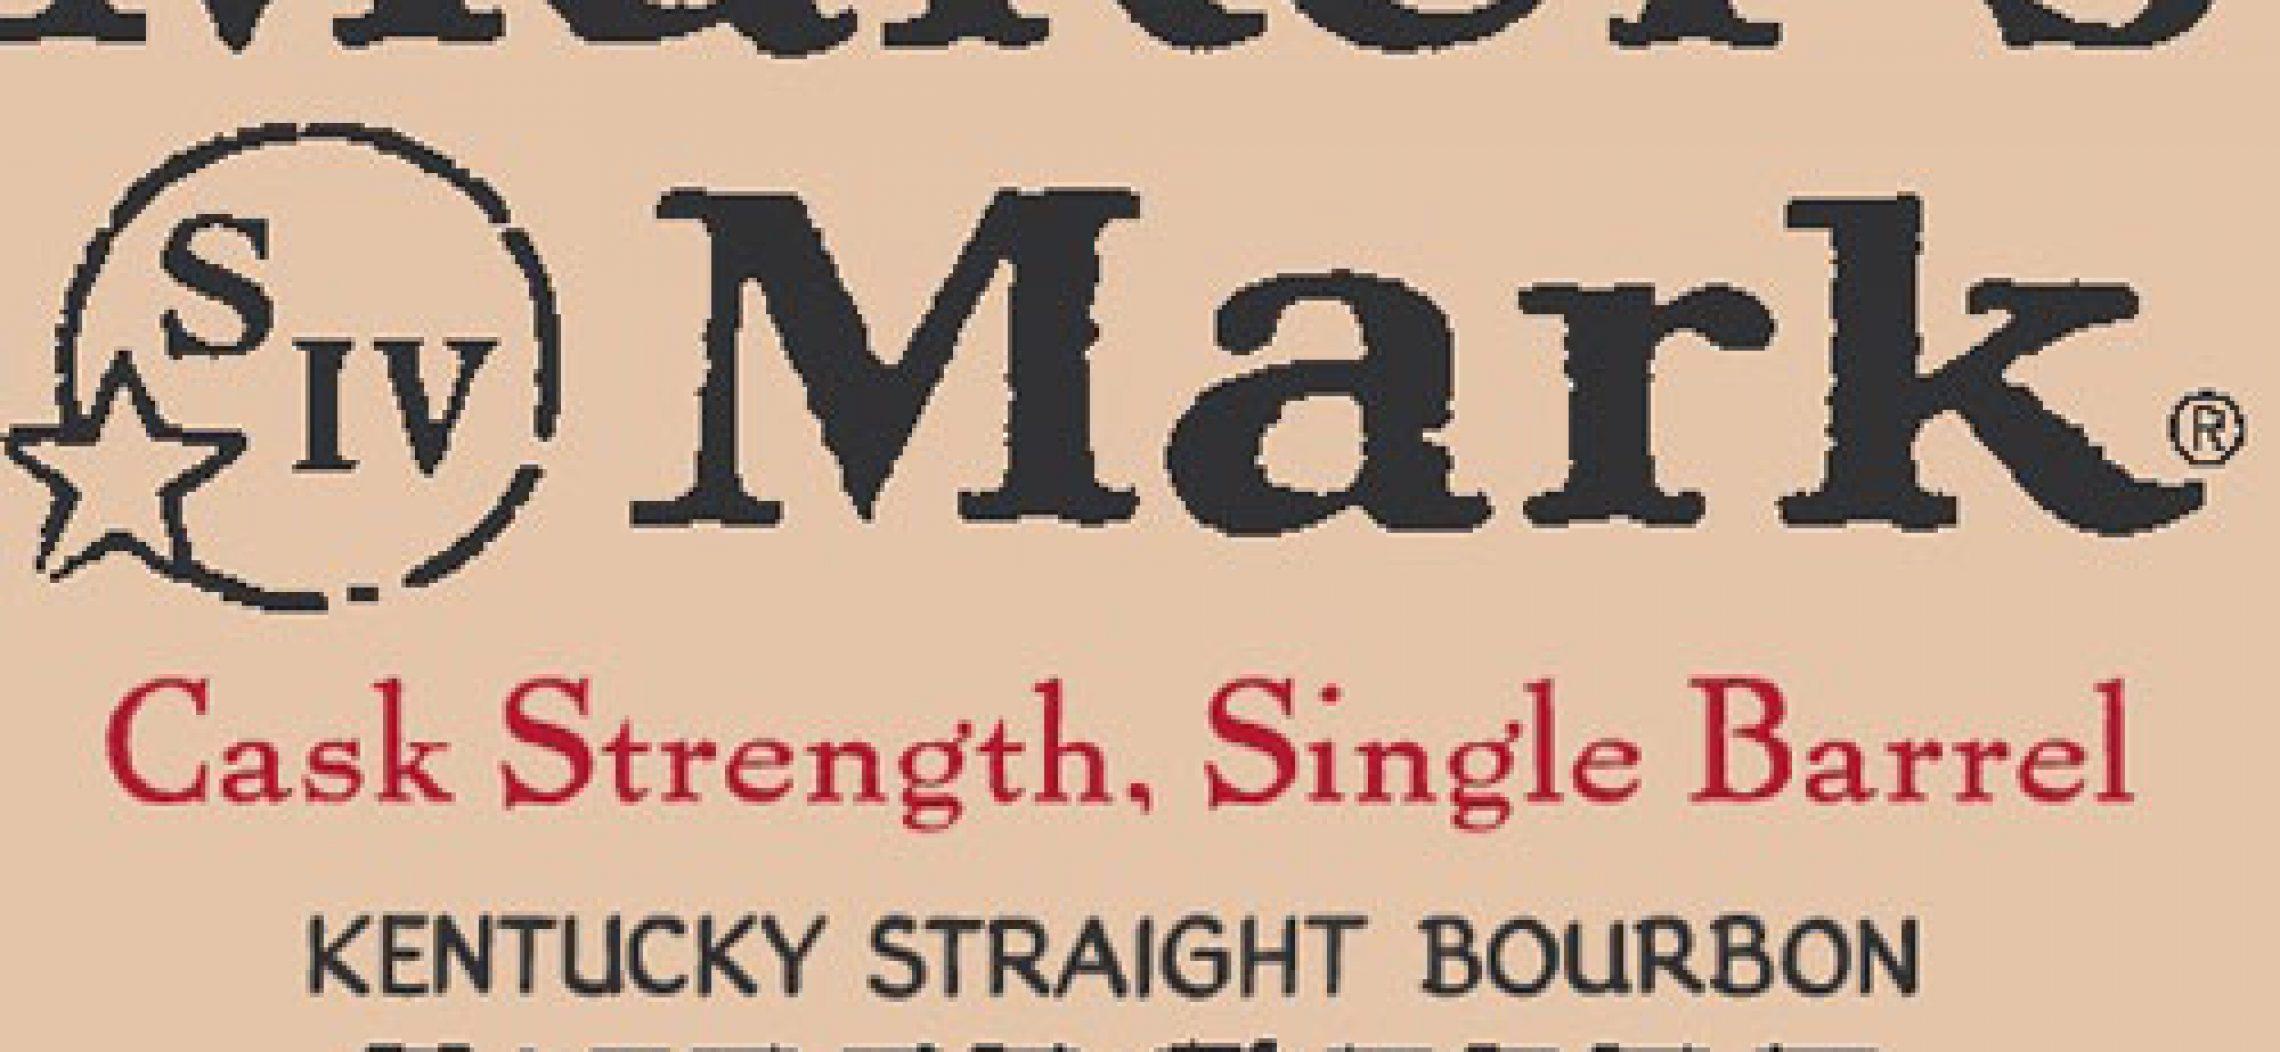 Maker's Mark Cask Strength Single Barrel